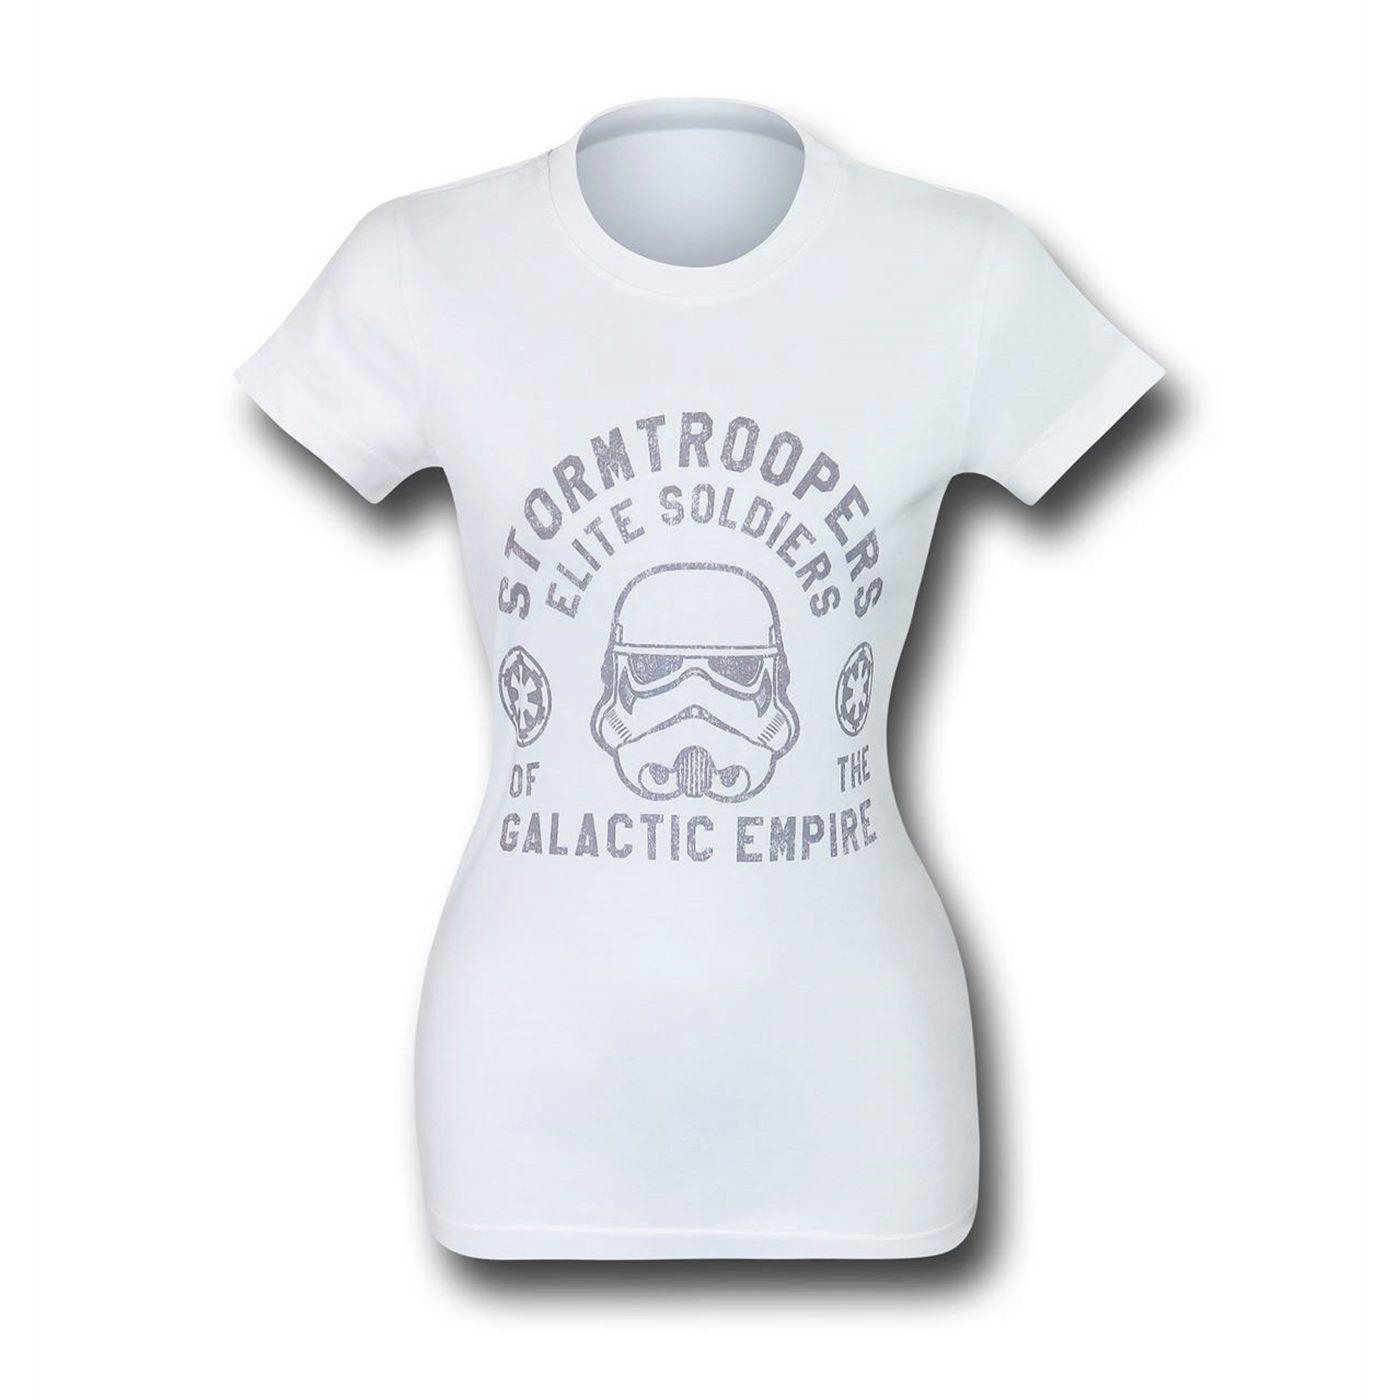 Star Wars Rogue One Elite Troopers Women's T-Shirt